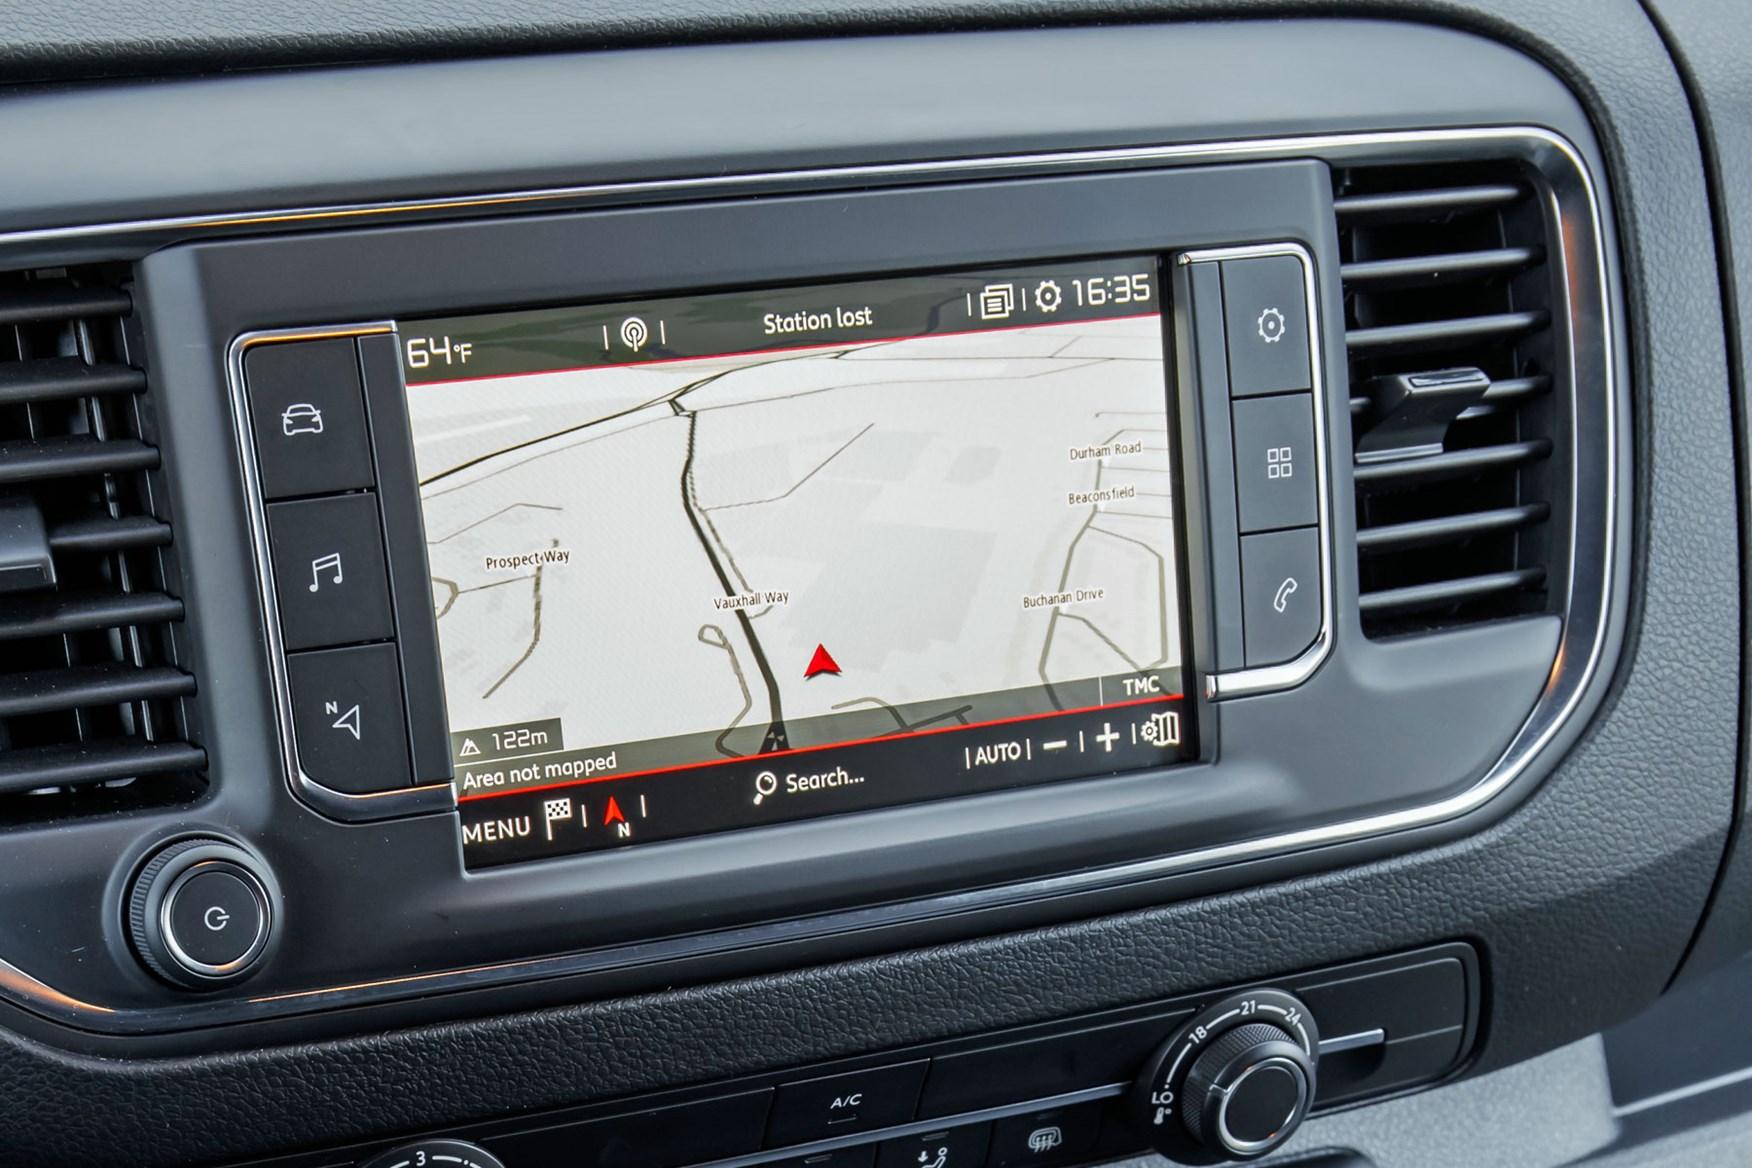 Vauxhall Vivaro review - top-spec infotainment system with sat-nav